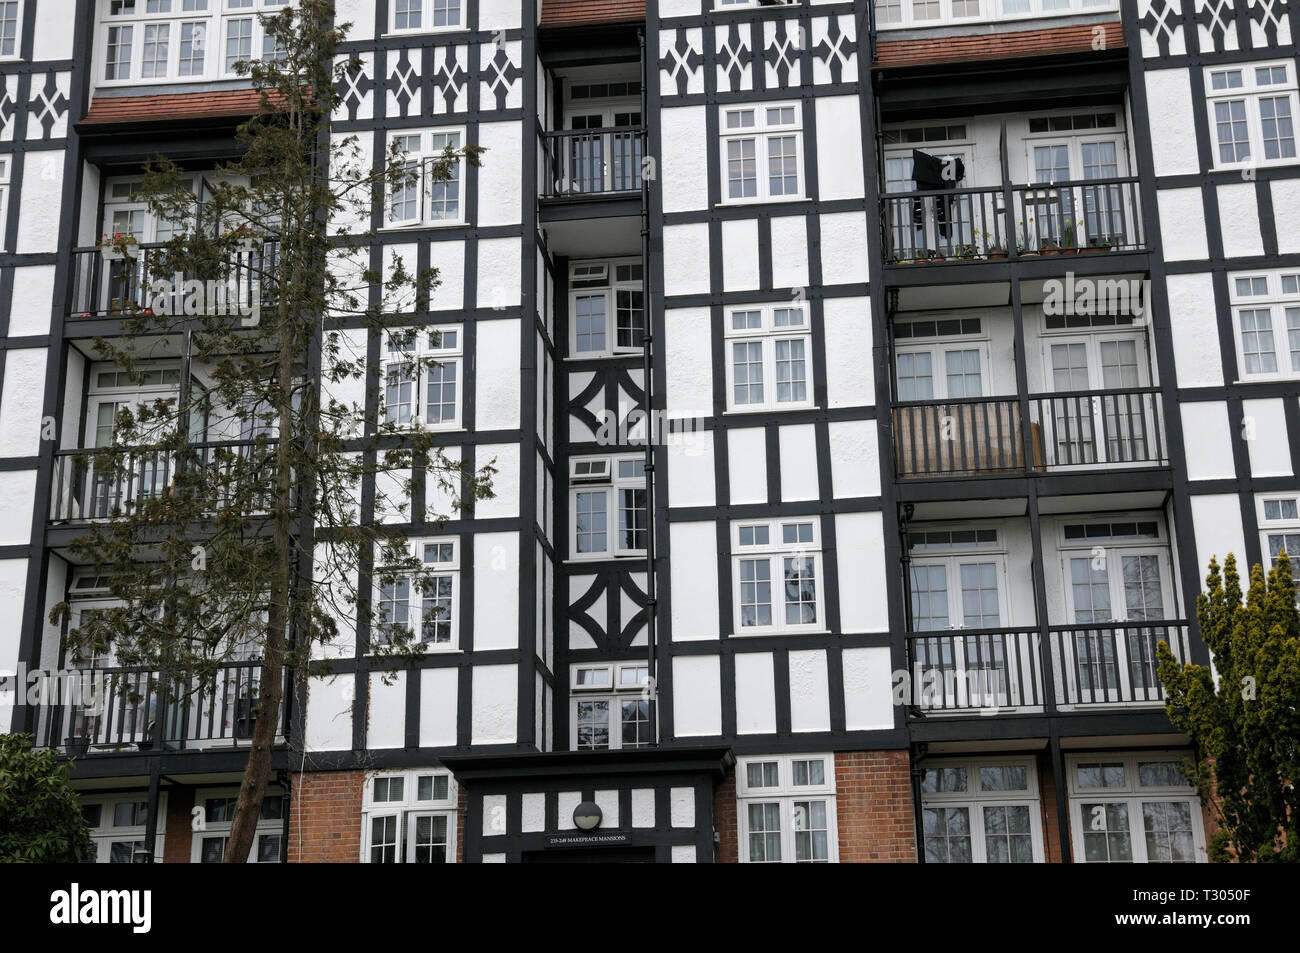 Mock tudor half-timbered houses, Makepeace Mansions, Makepeace Avenue, Holly Lodge Estate, Highgate, London, England, UK - Stock Image